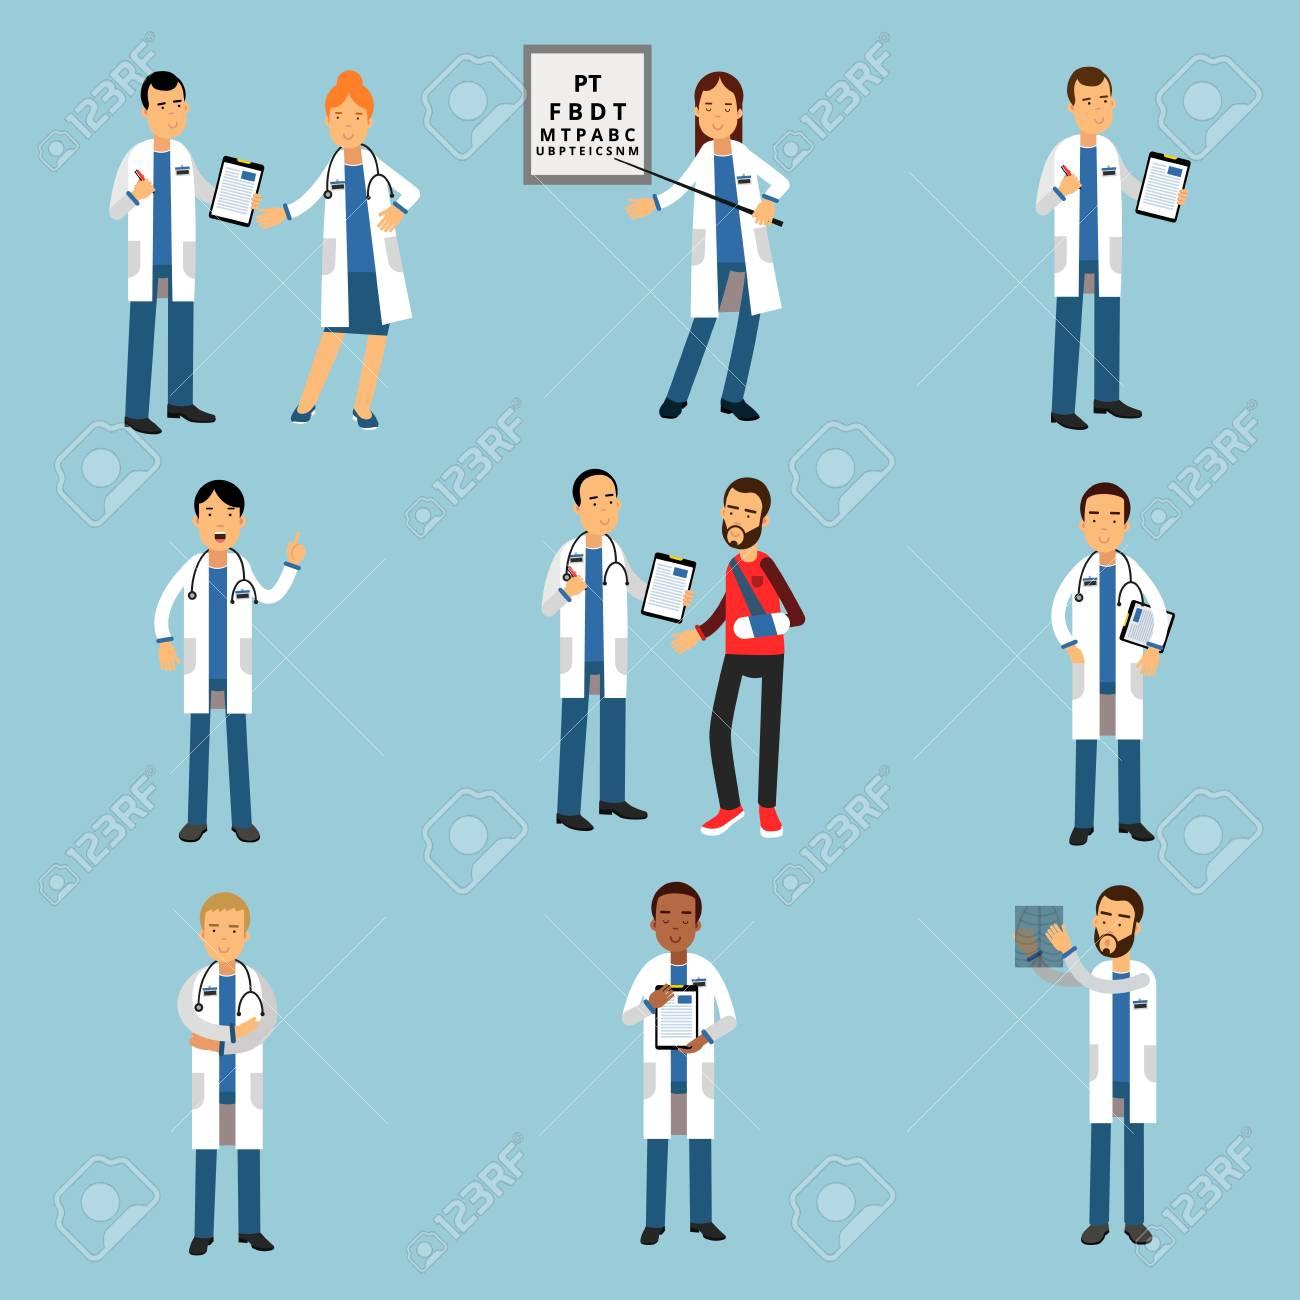 Practitioner young doctors set, hospital medical staff detailed colorful Illustrations - 80123361